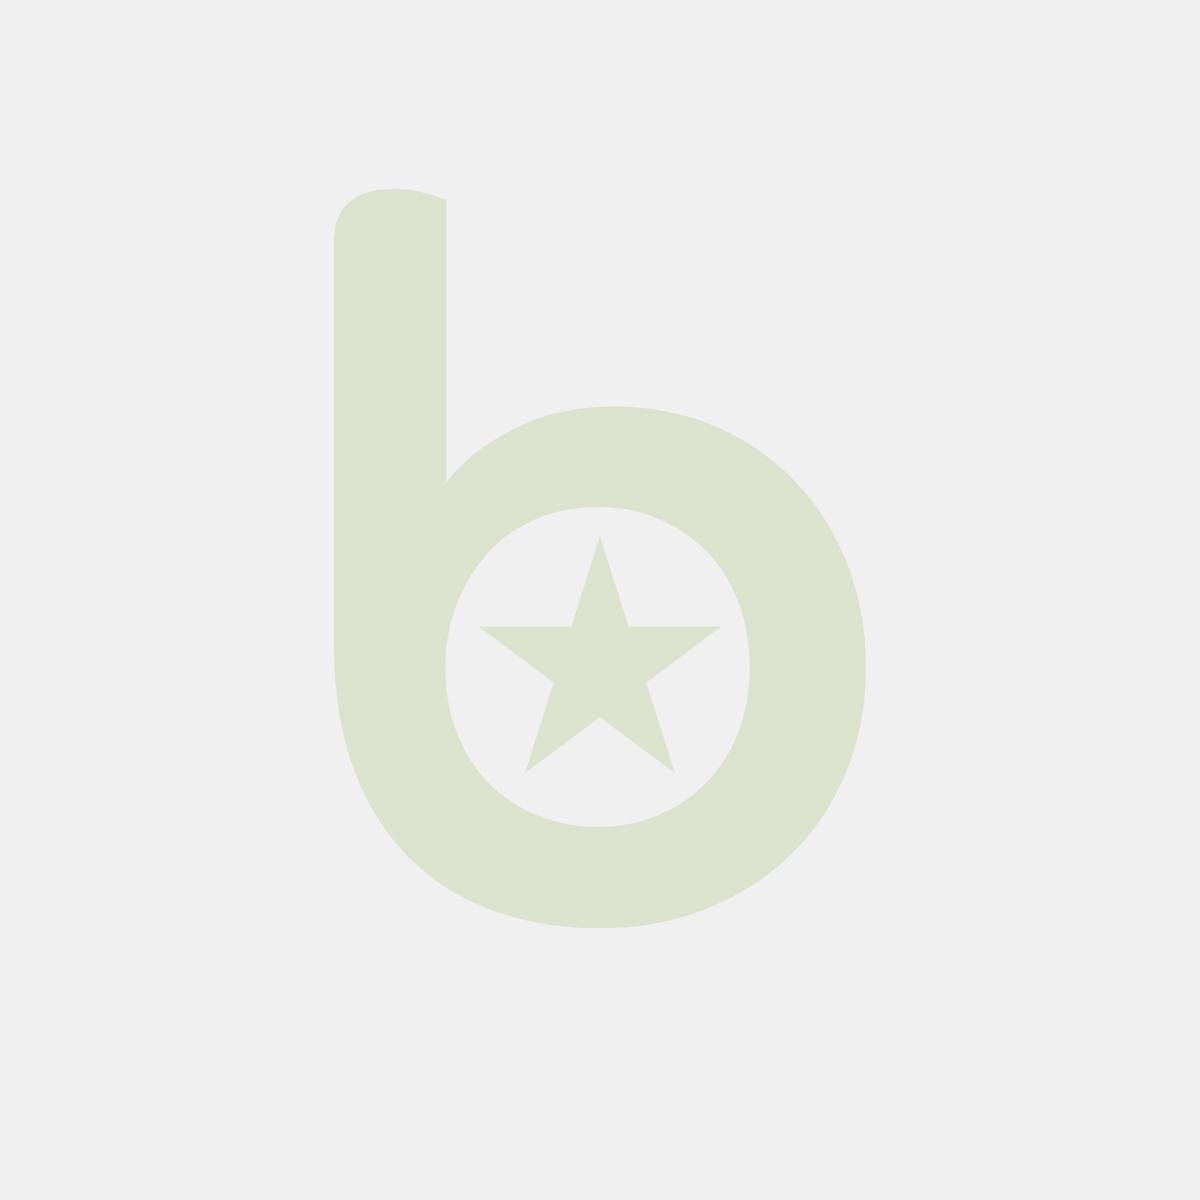 Pokrywka do miski PP SABERT 750ml i 1000ml, cena za opakowanie 50szt